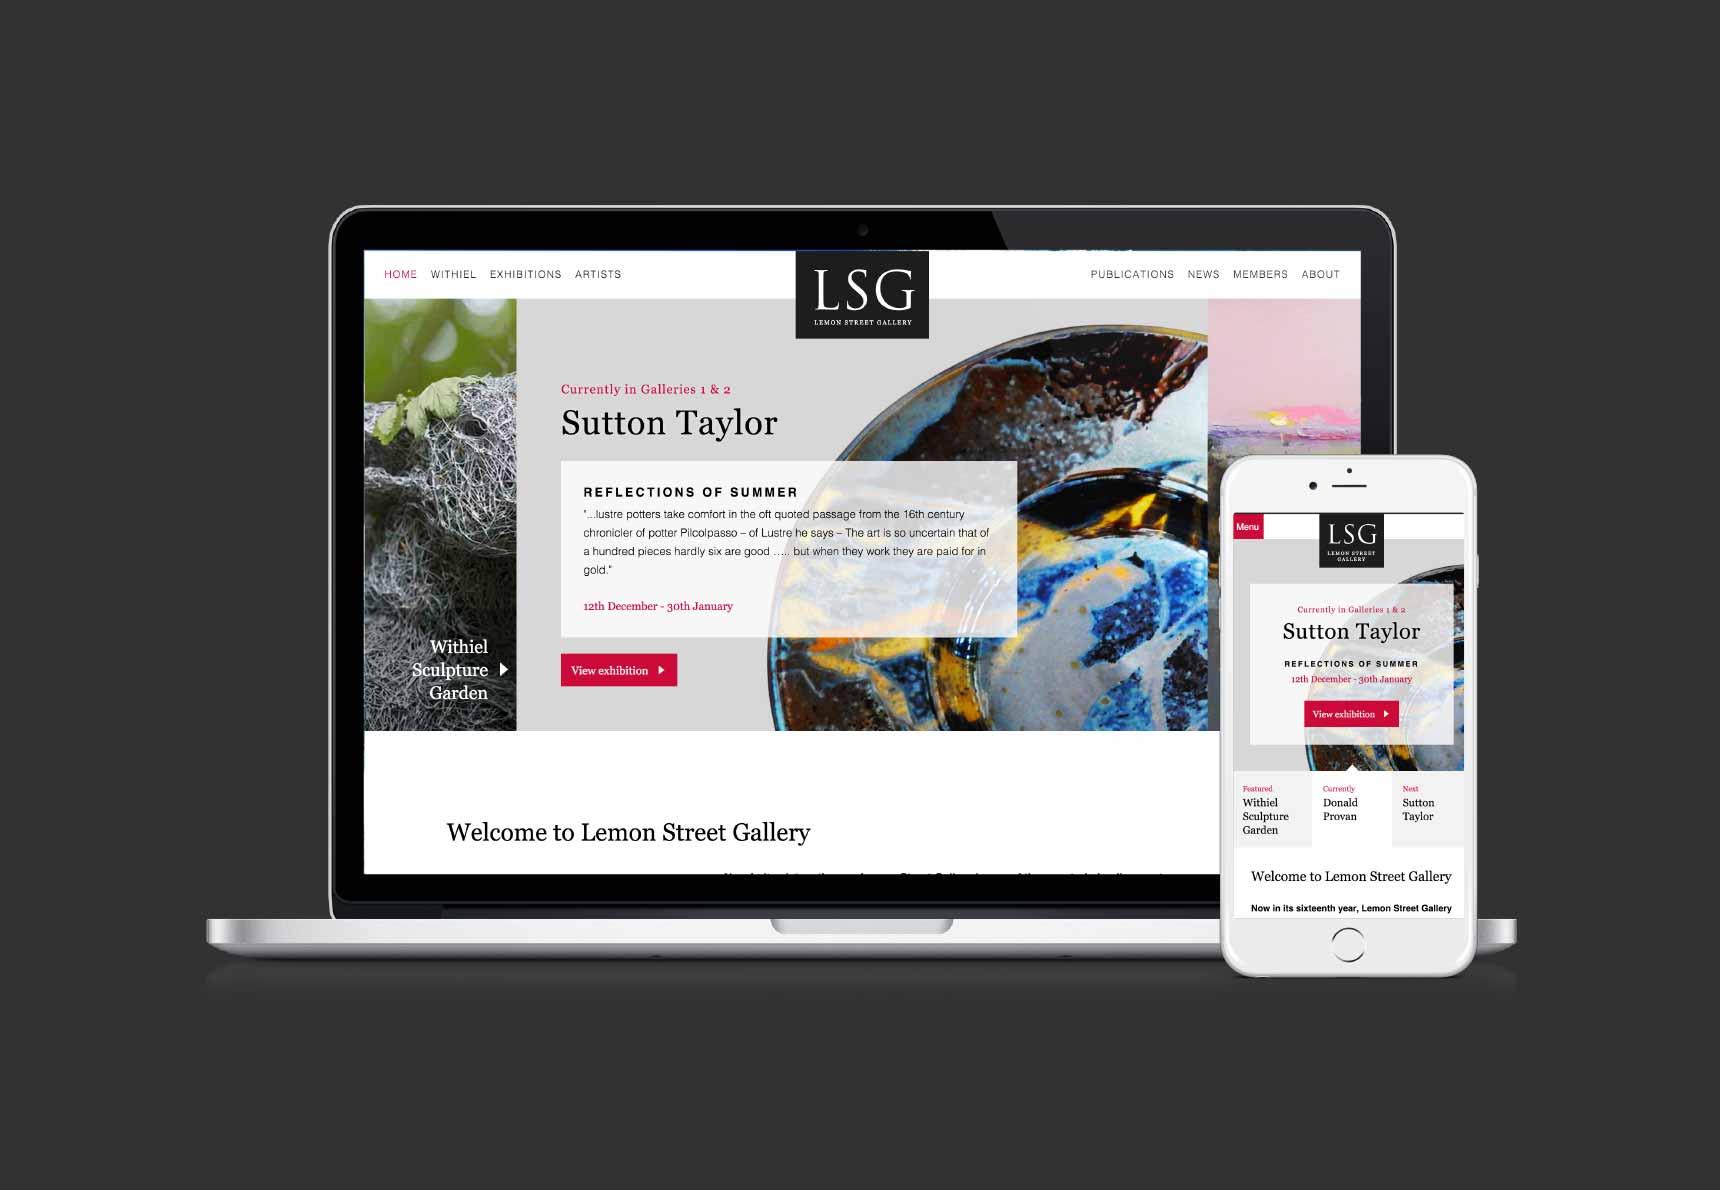 LSG responsive website screen grabs in MacBook Pro and iPhone by Geoff Muskett